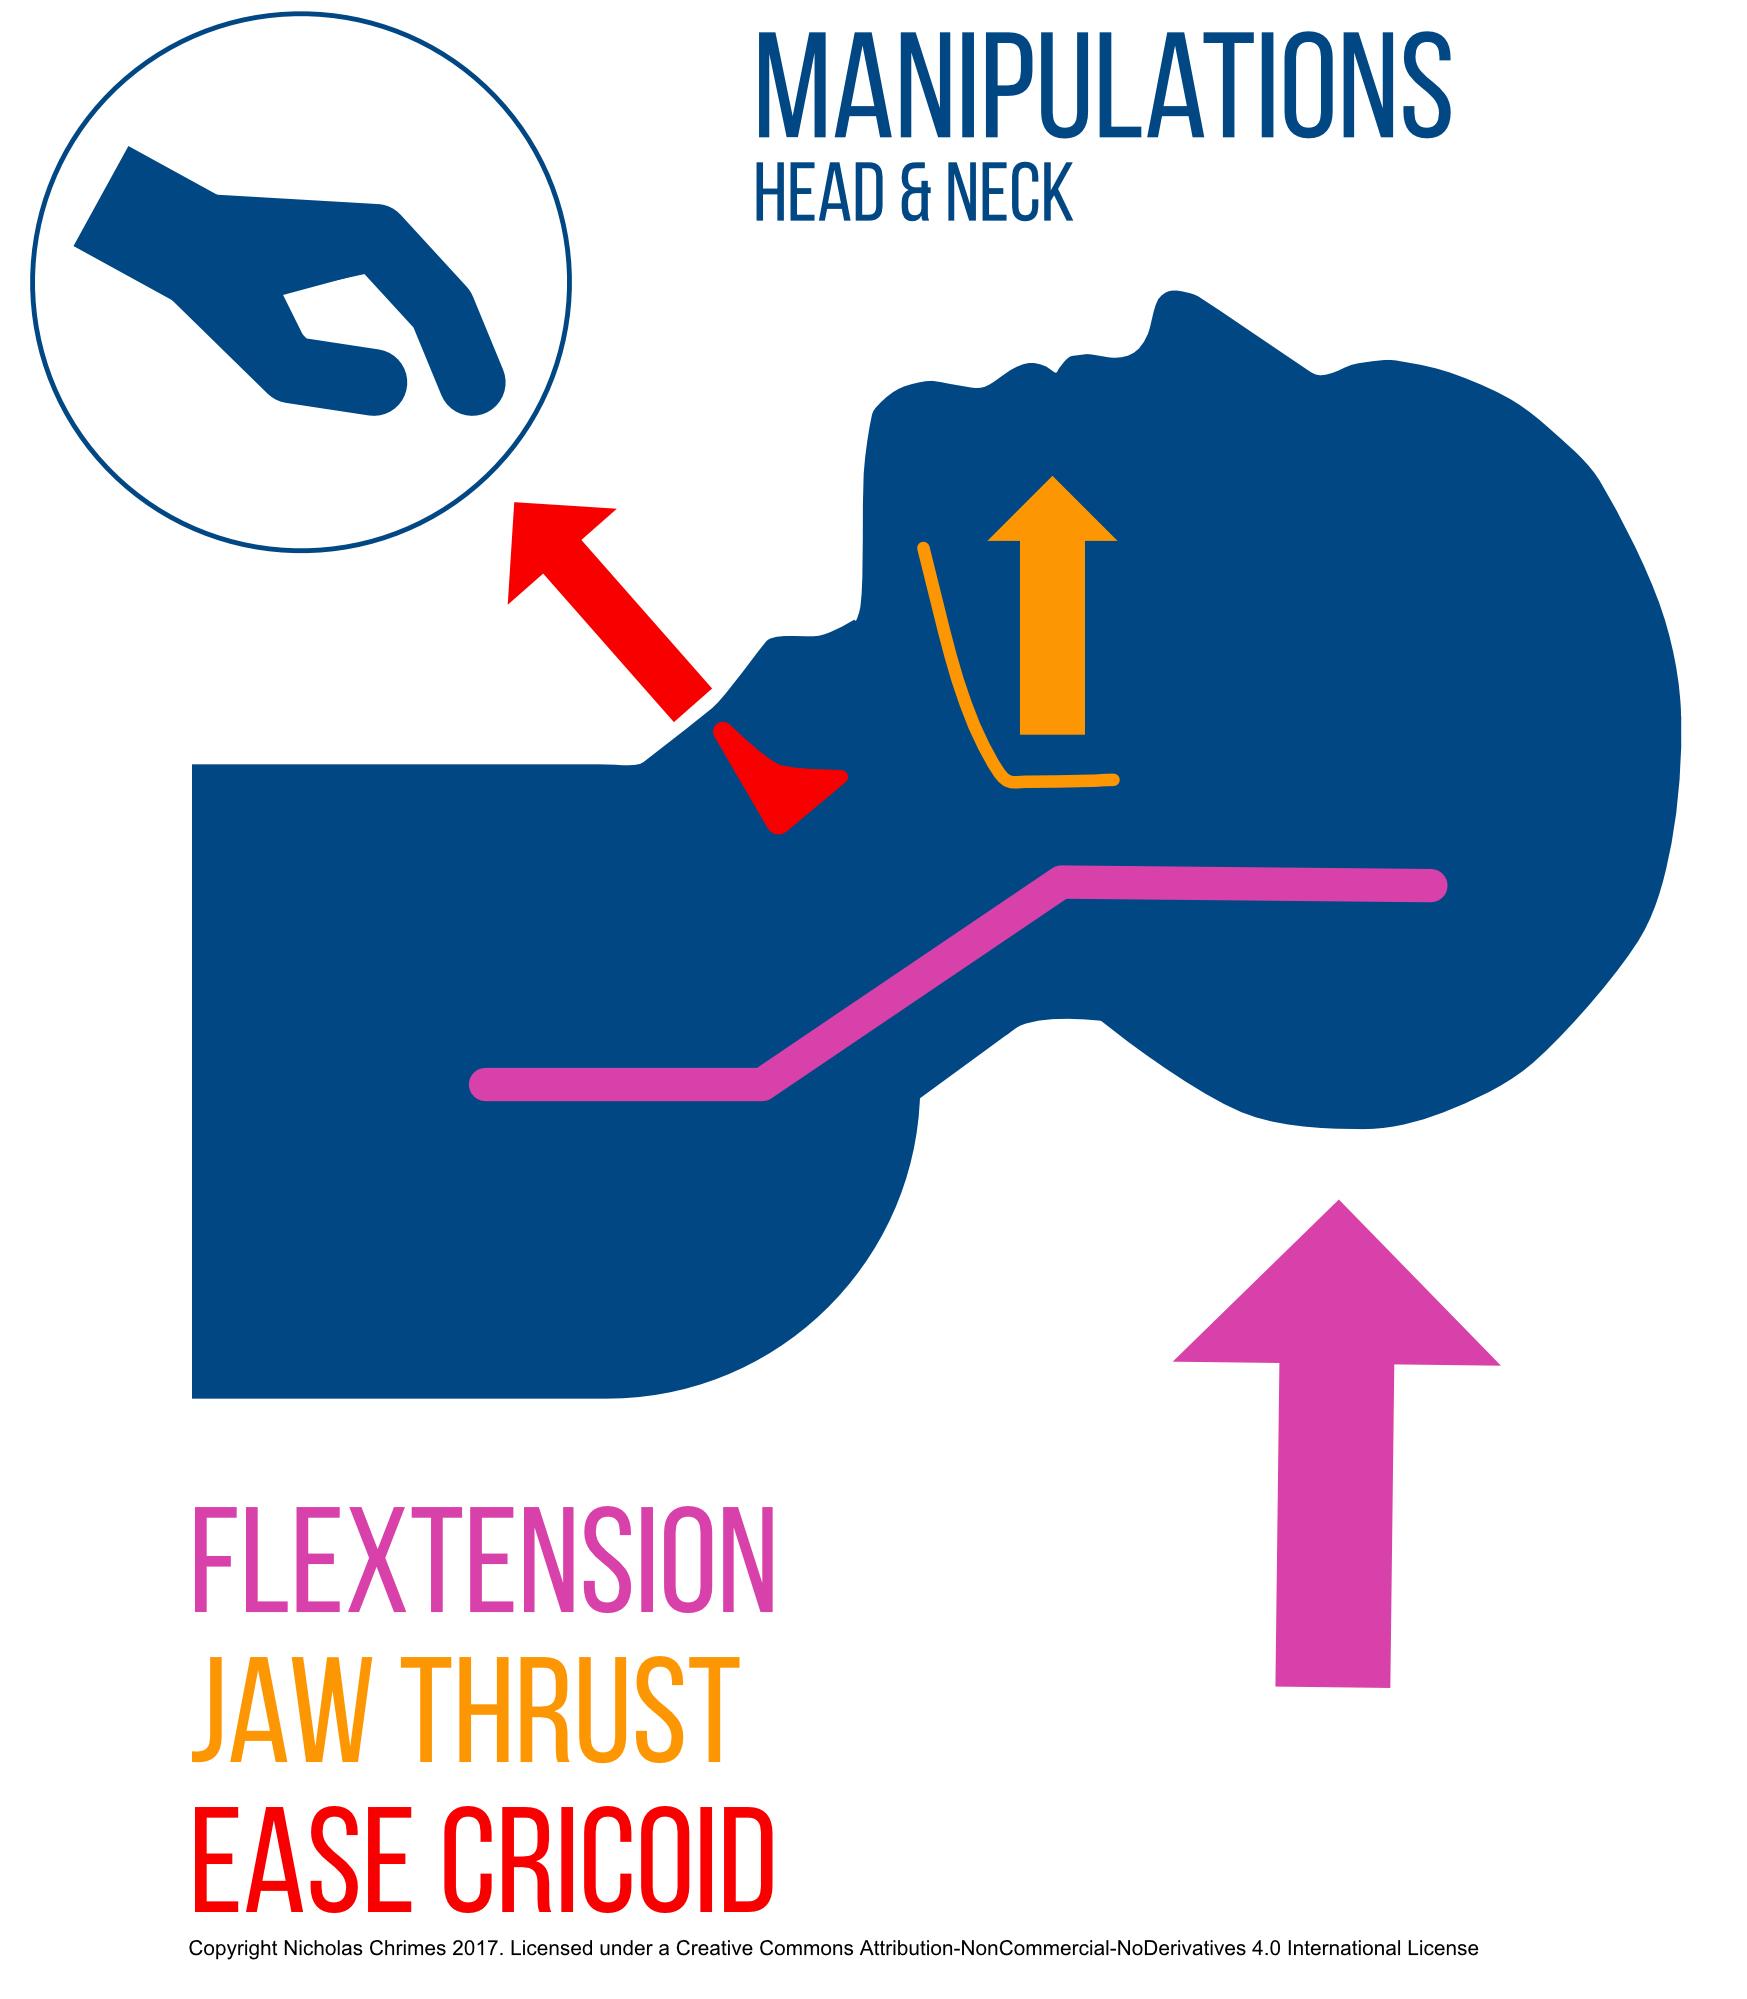 FMV Head, Neck & Larynx Manipulations